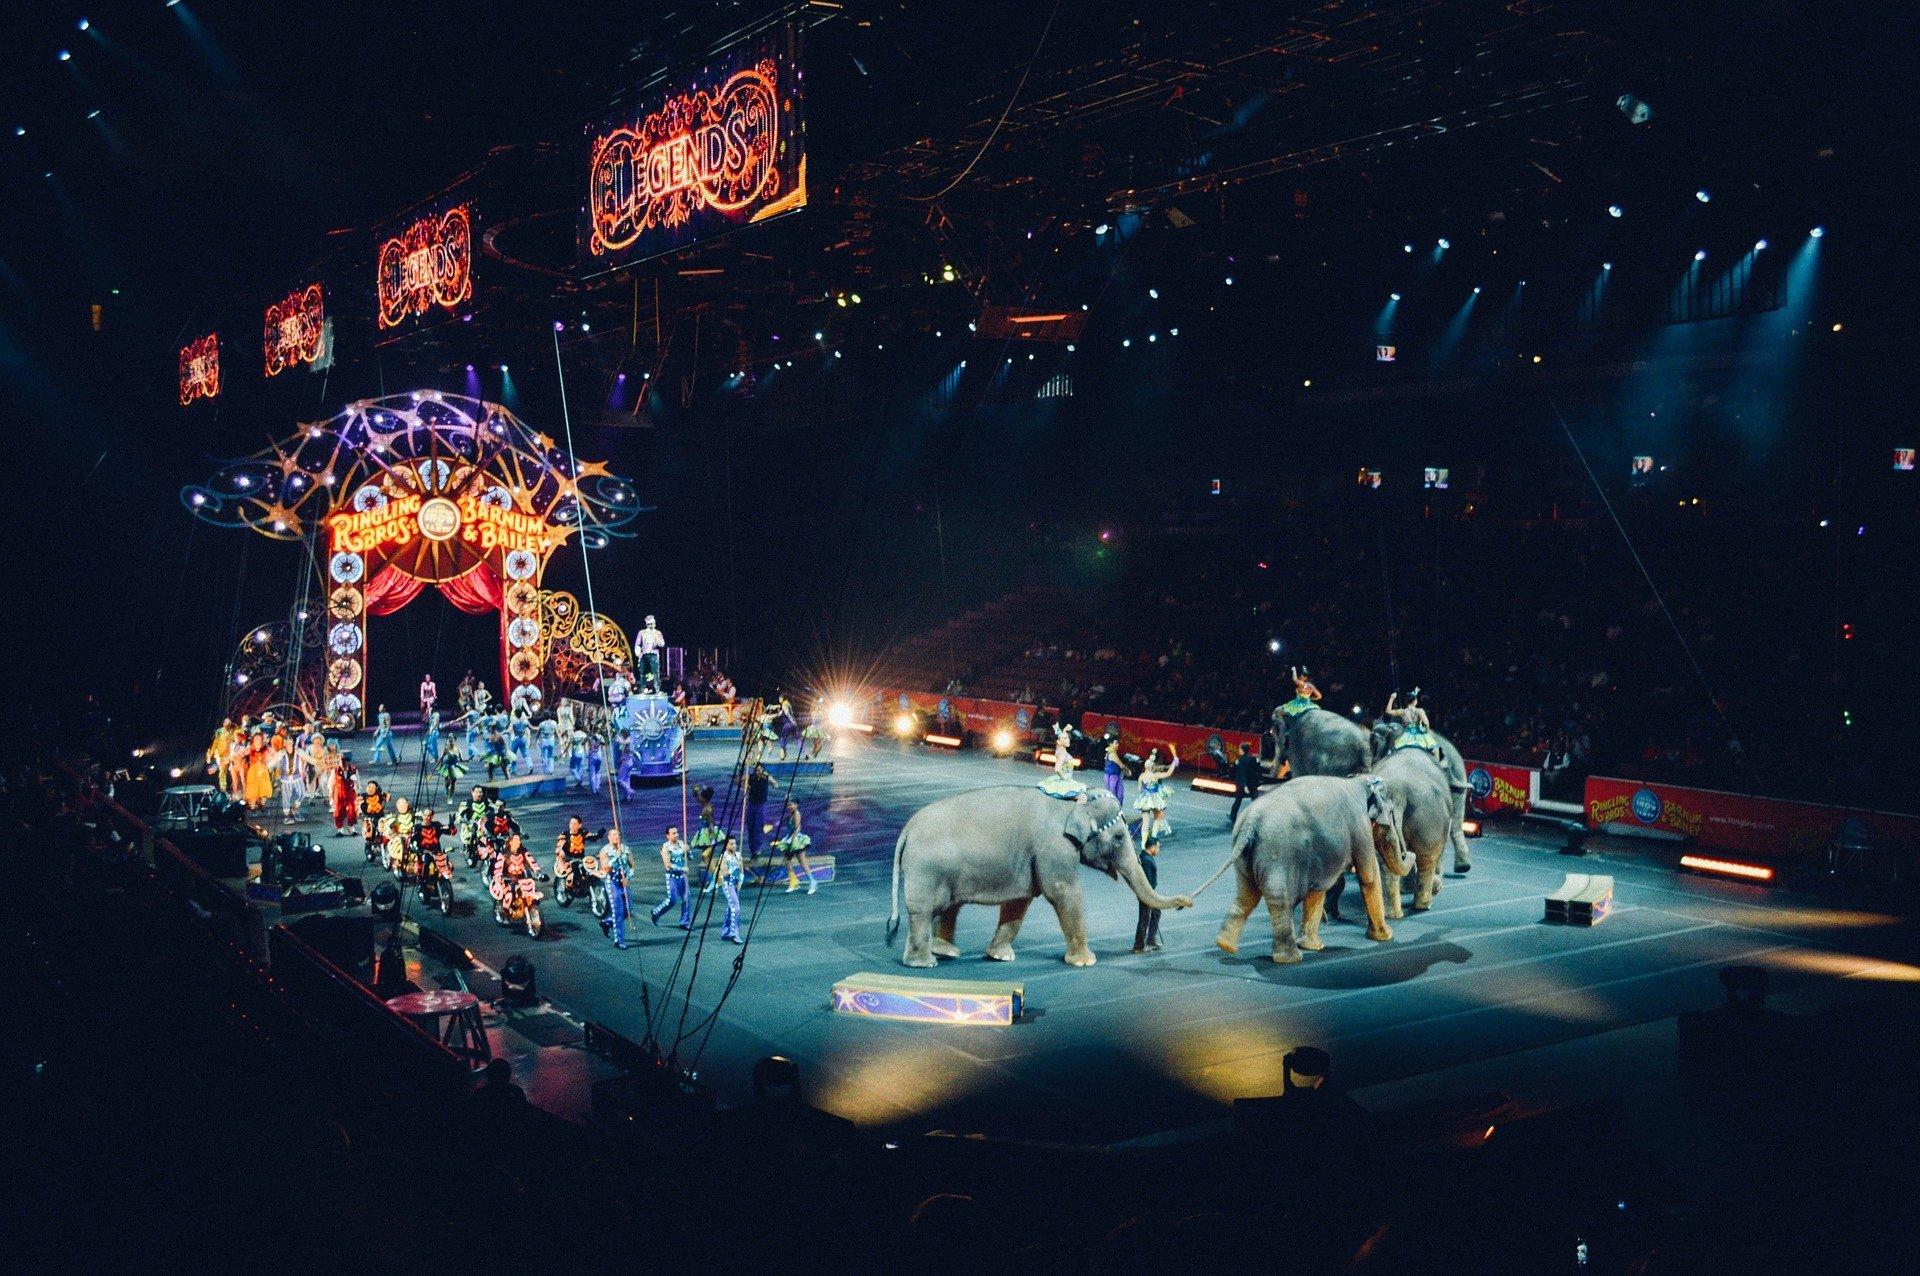 Circus arena with elephants.   Source: Pixabay